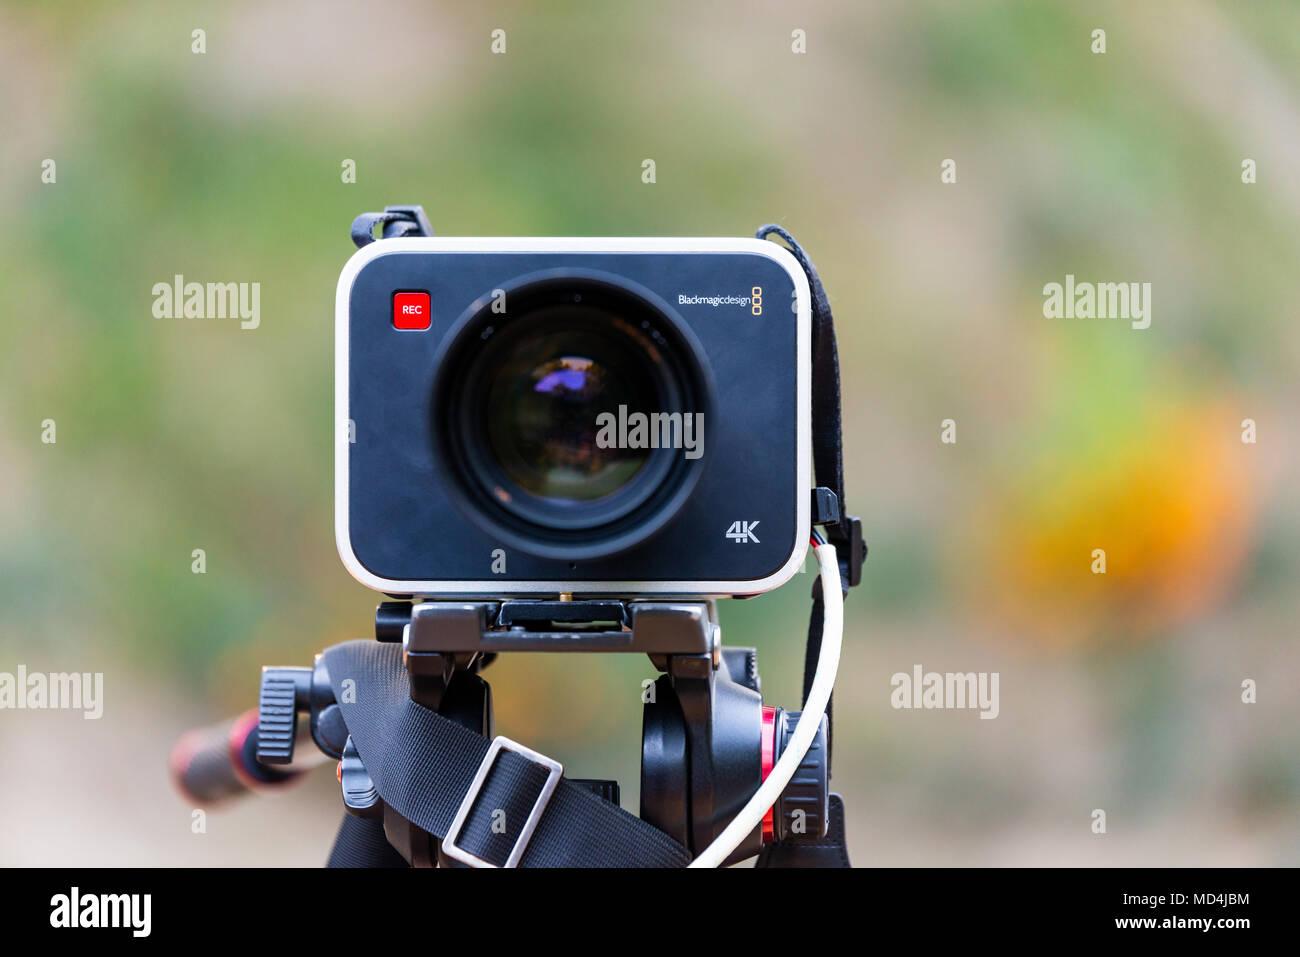 KATHMANDU, NEPAL - CIRCA OCTOBER 2016: A Blackmagic Design Production Camera 4K on a tripod. Blackmagic Design is an Australian digital cinema company - Stock Image